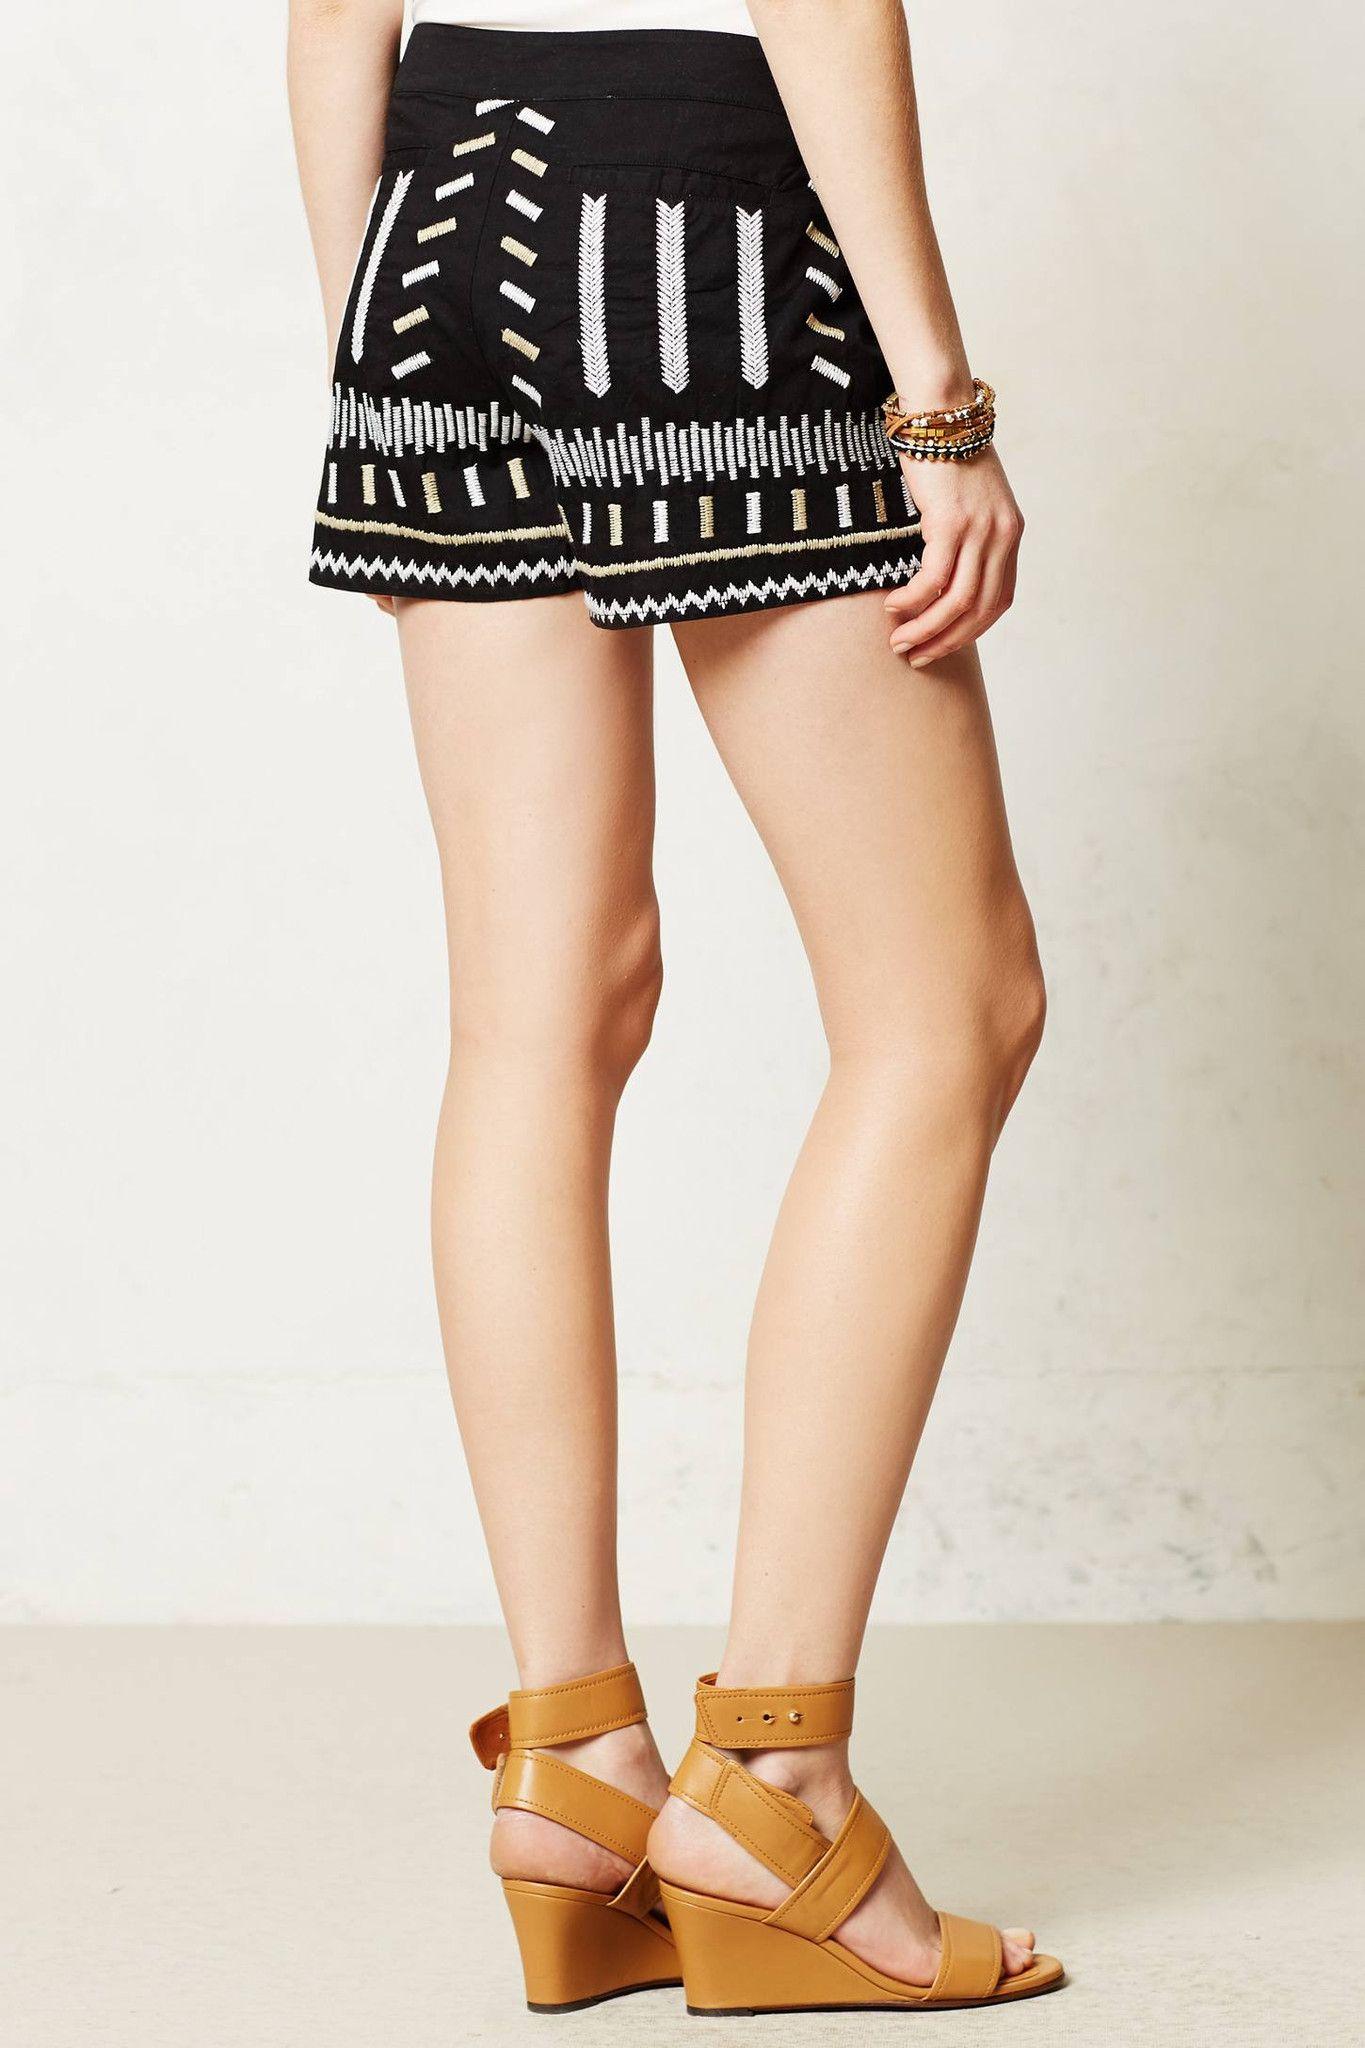 a7e4bdb172 Dash-Dash Shorts | Clothes & Accessories | Shorts, Shorts outfits ...